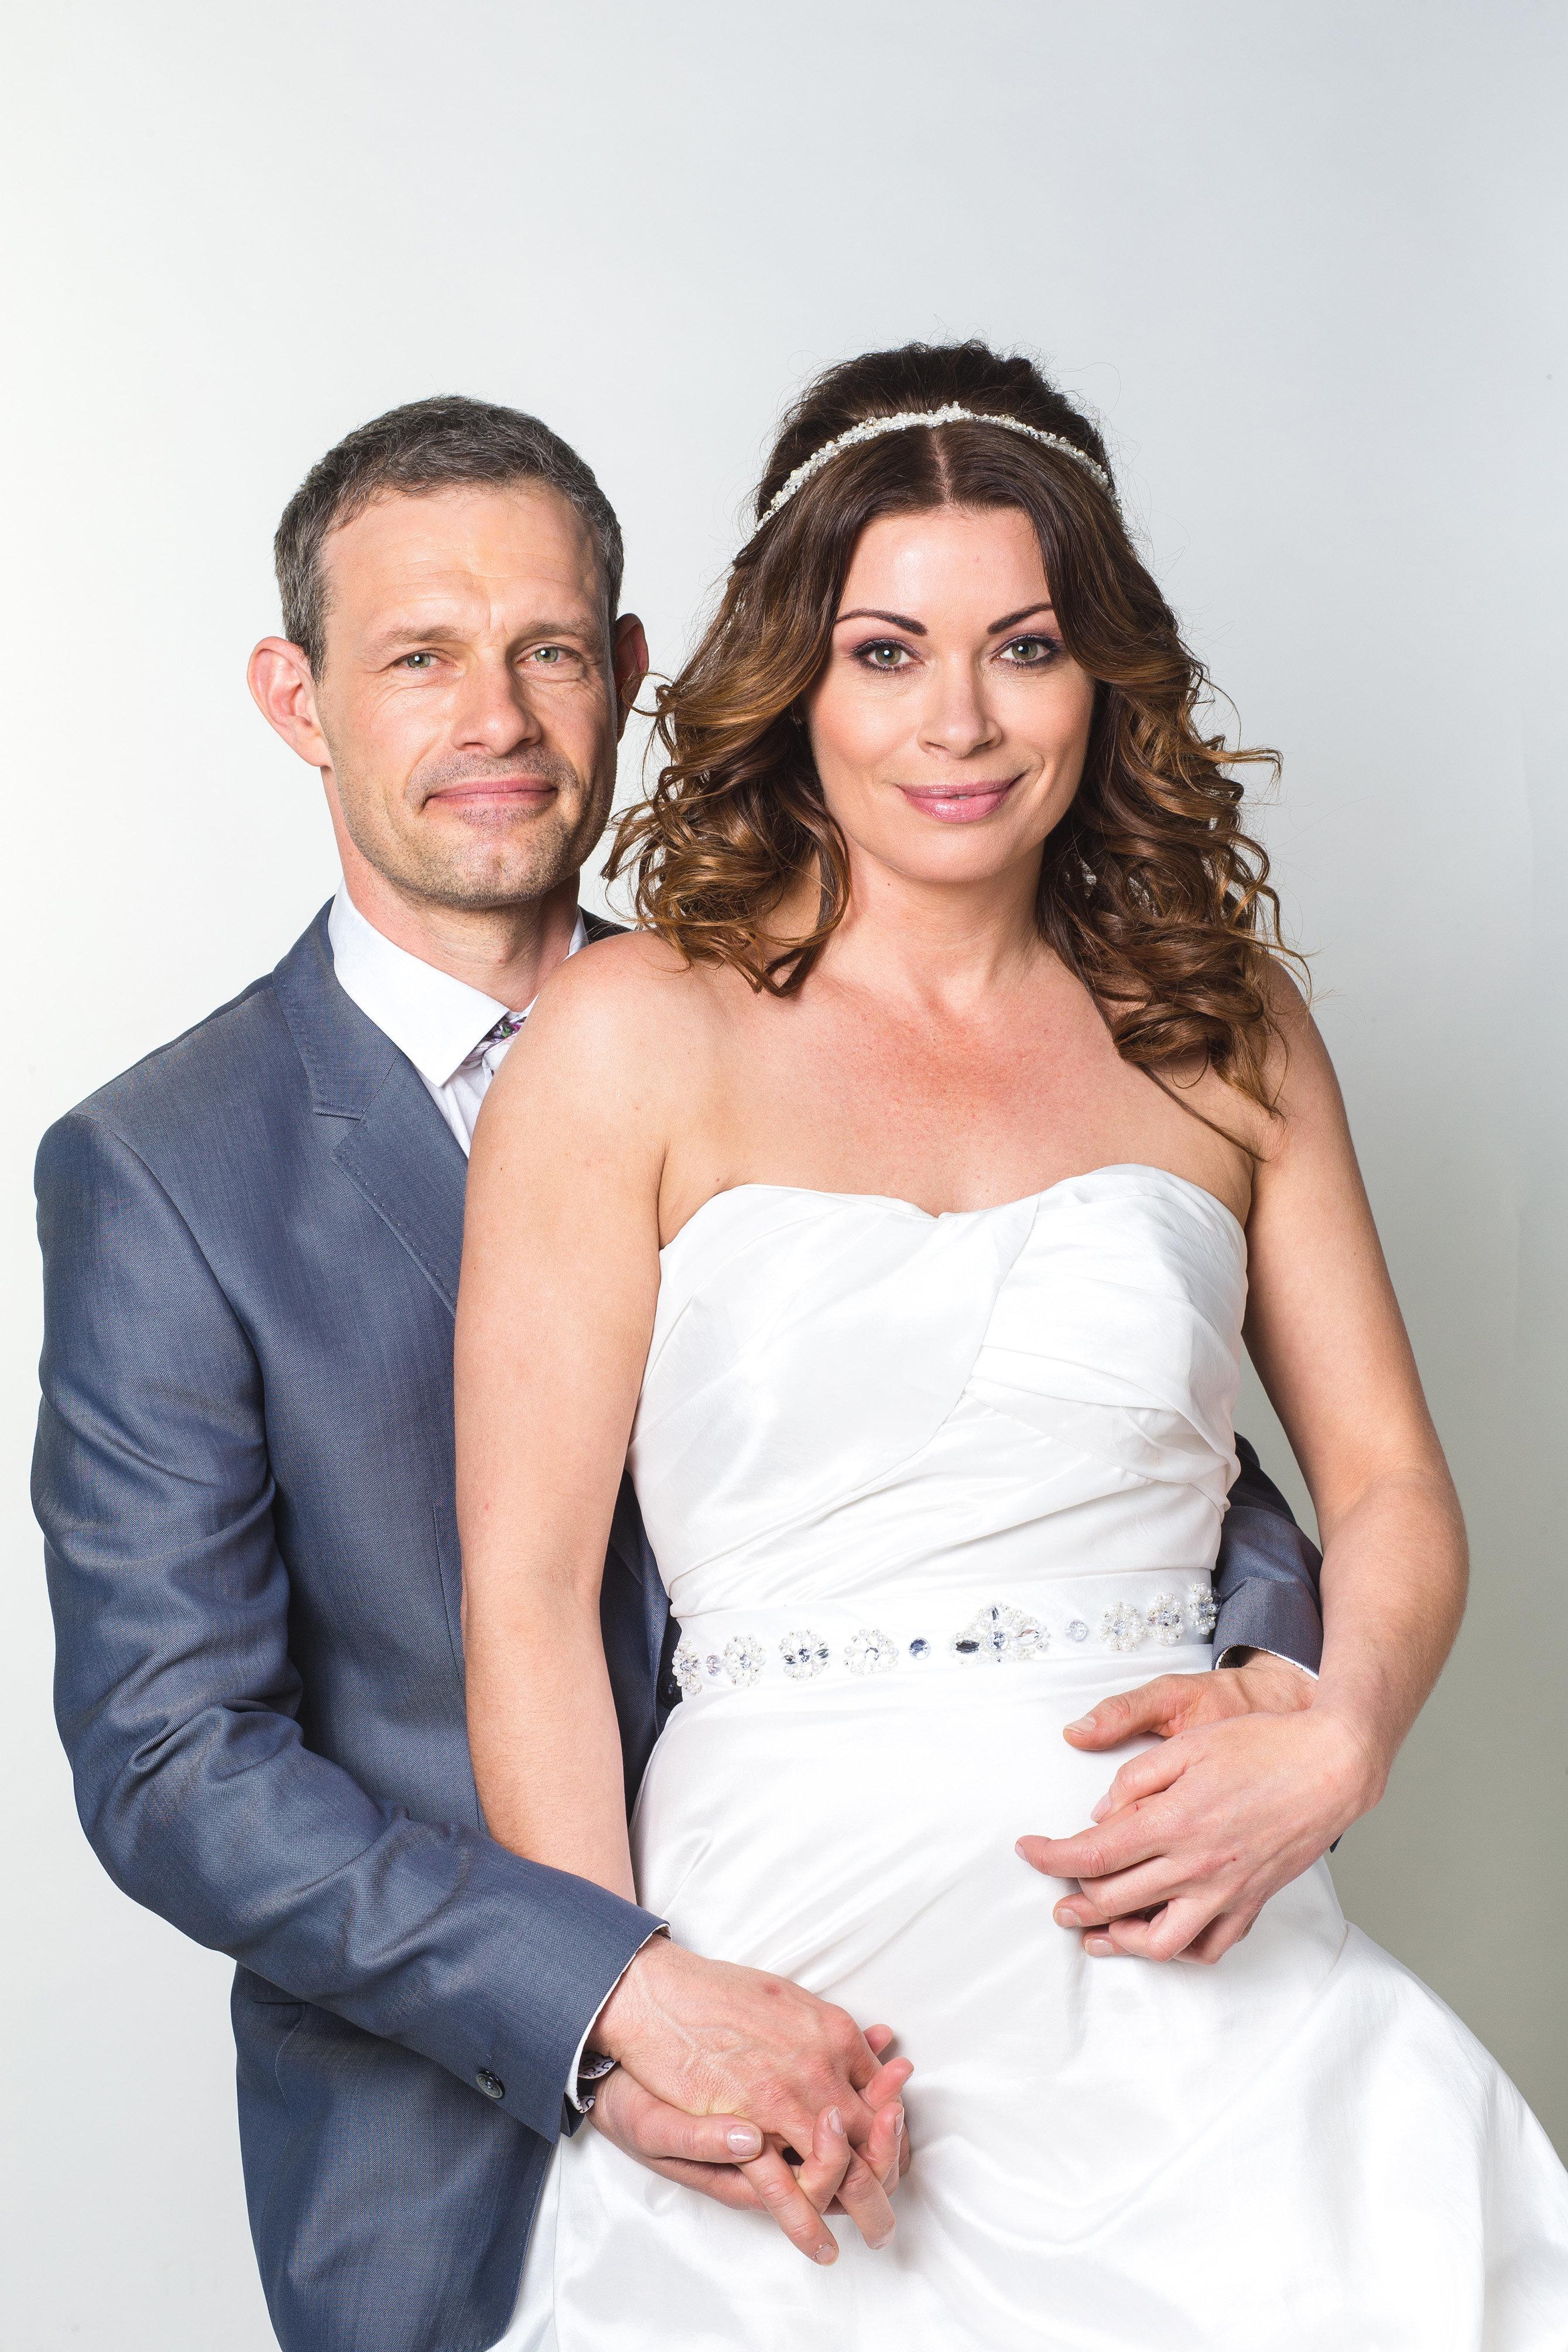 'Coronation Street' Spoilers: Carla Connor And Nick Tilsley's Wedding Photo